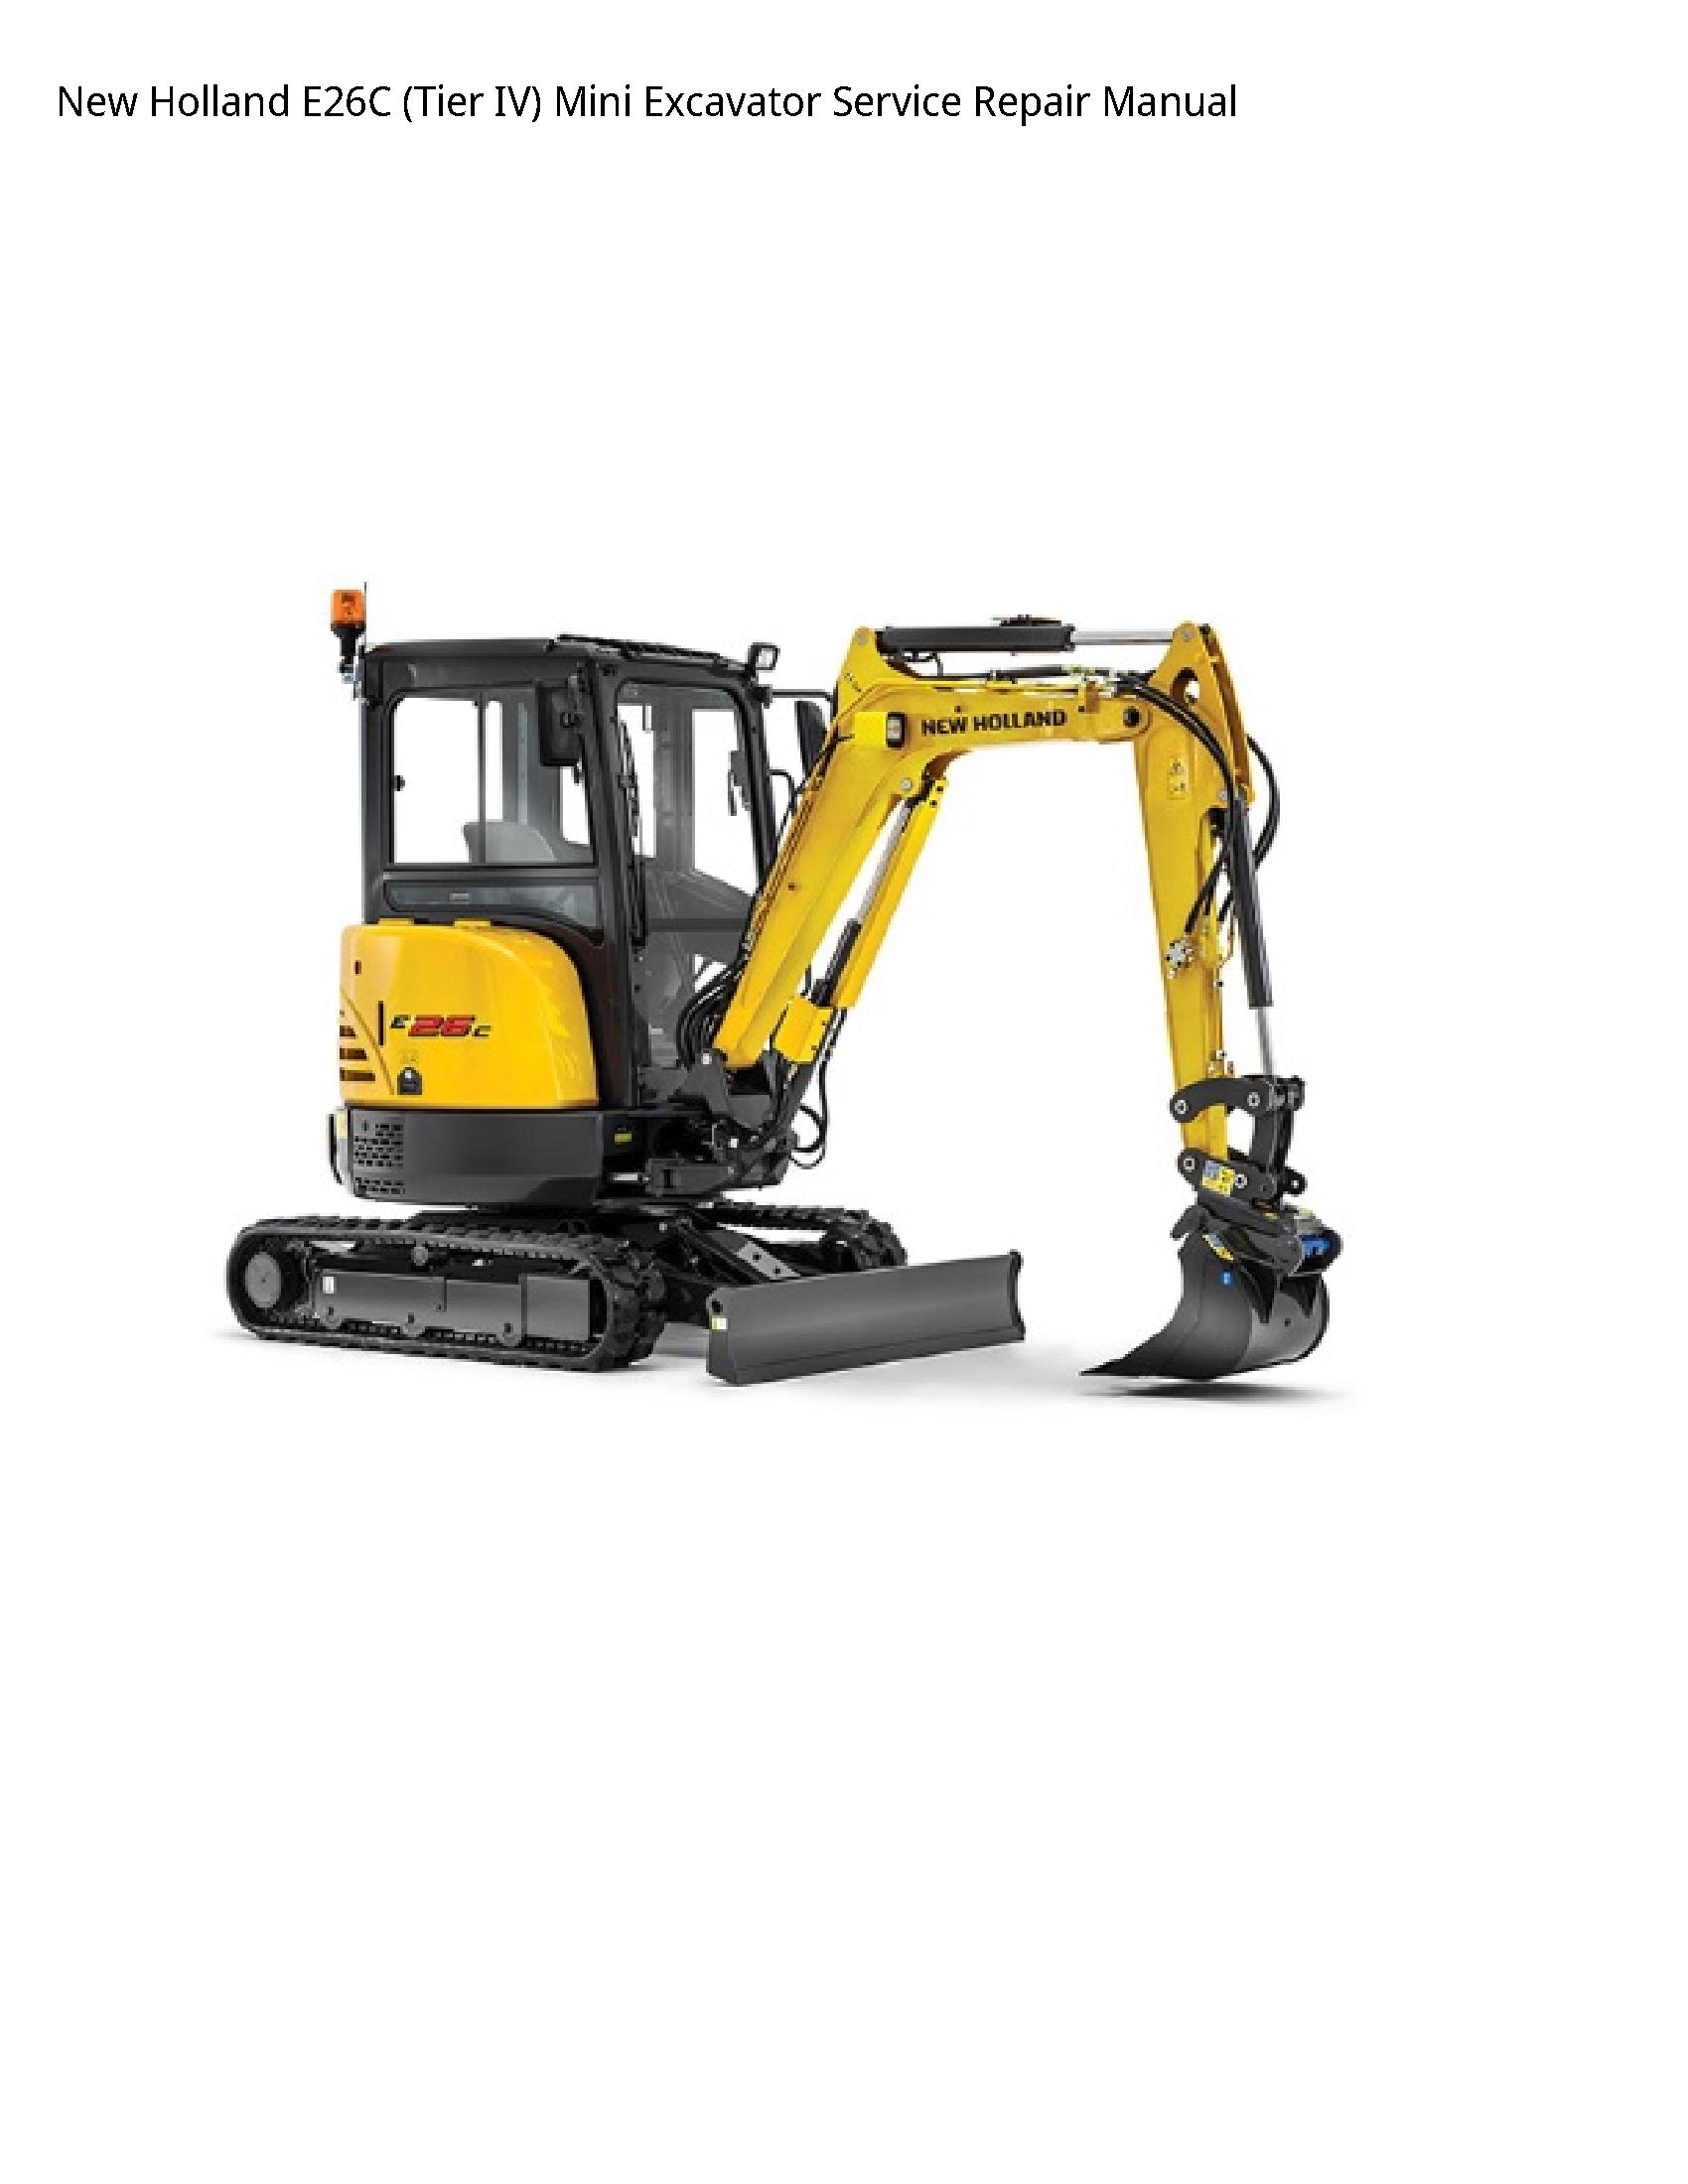 New Holland E26C (Tier IV) Mini Excavator manual